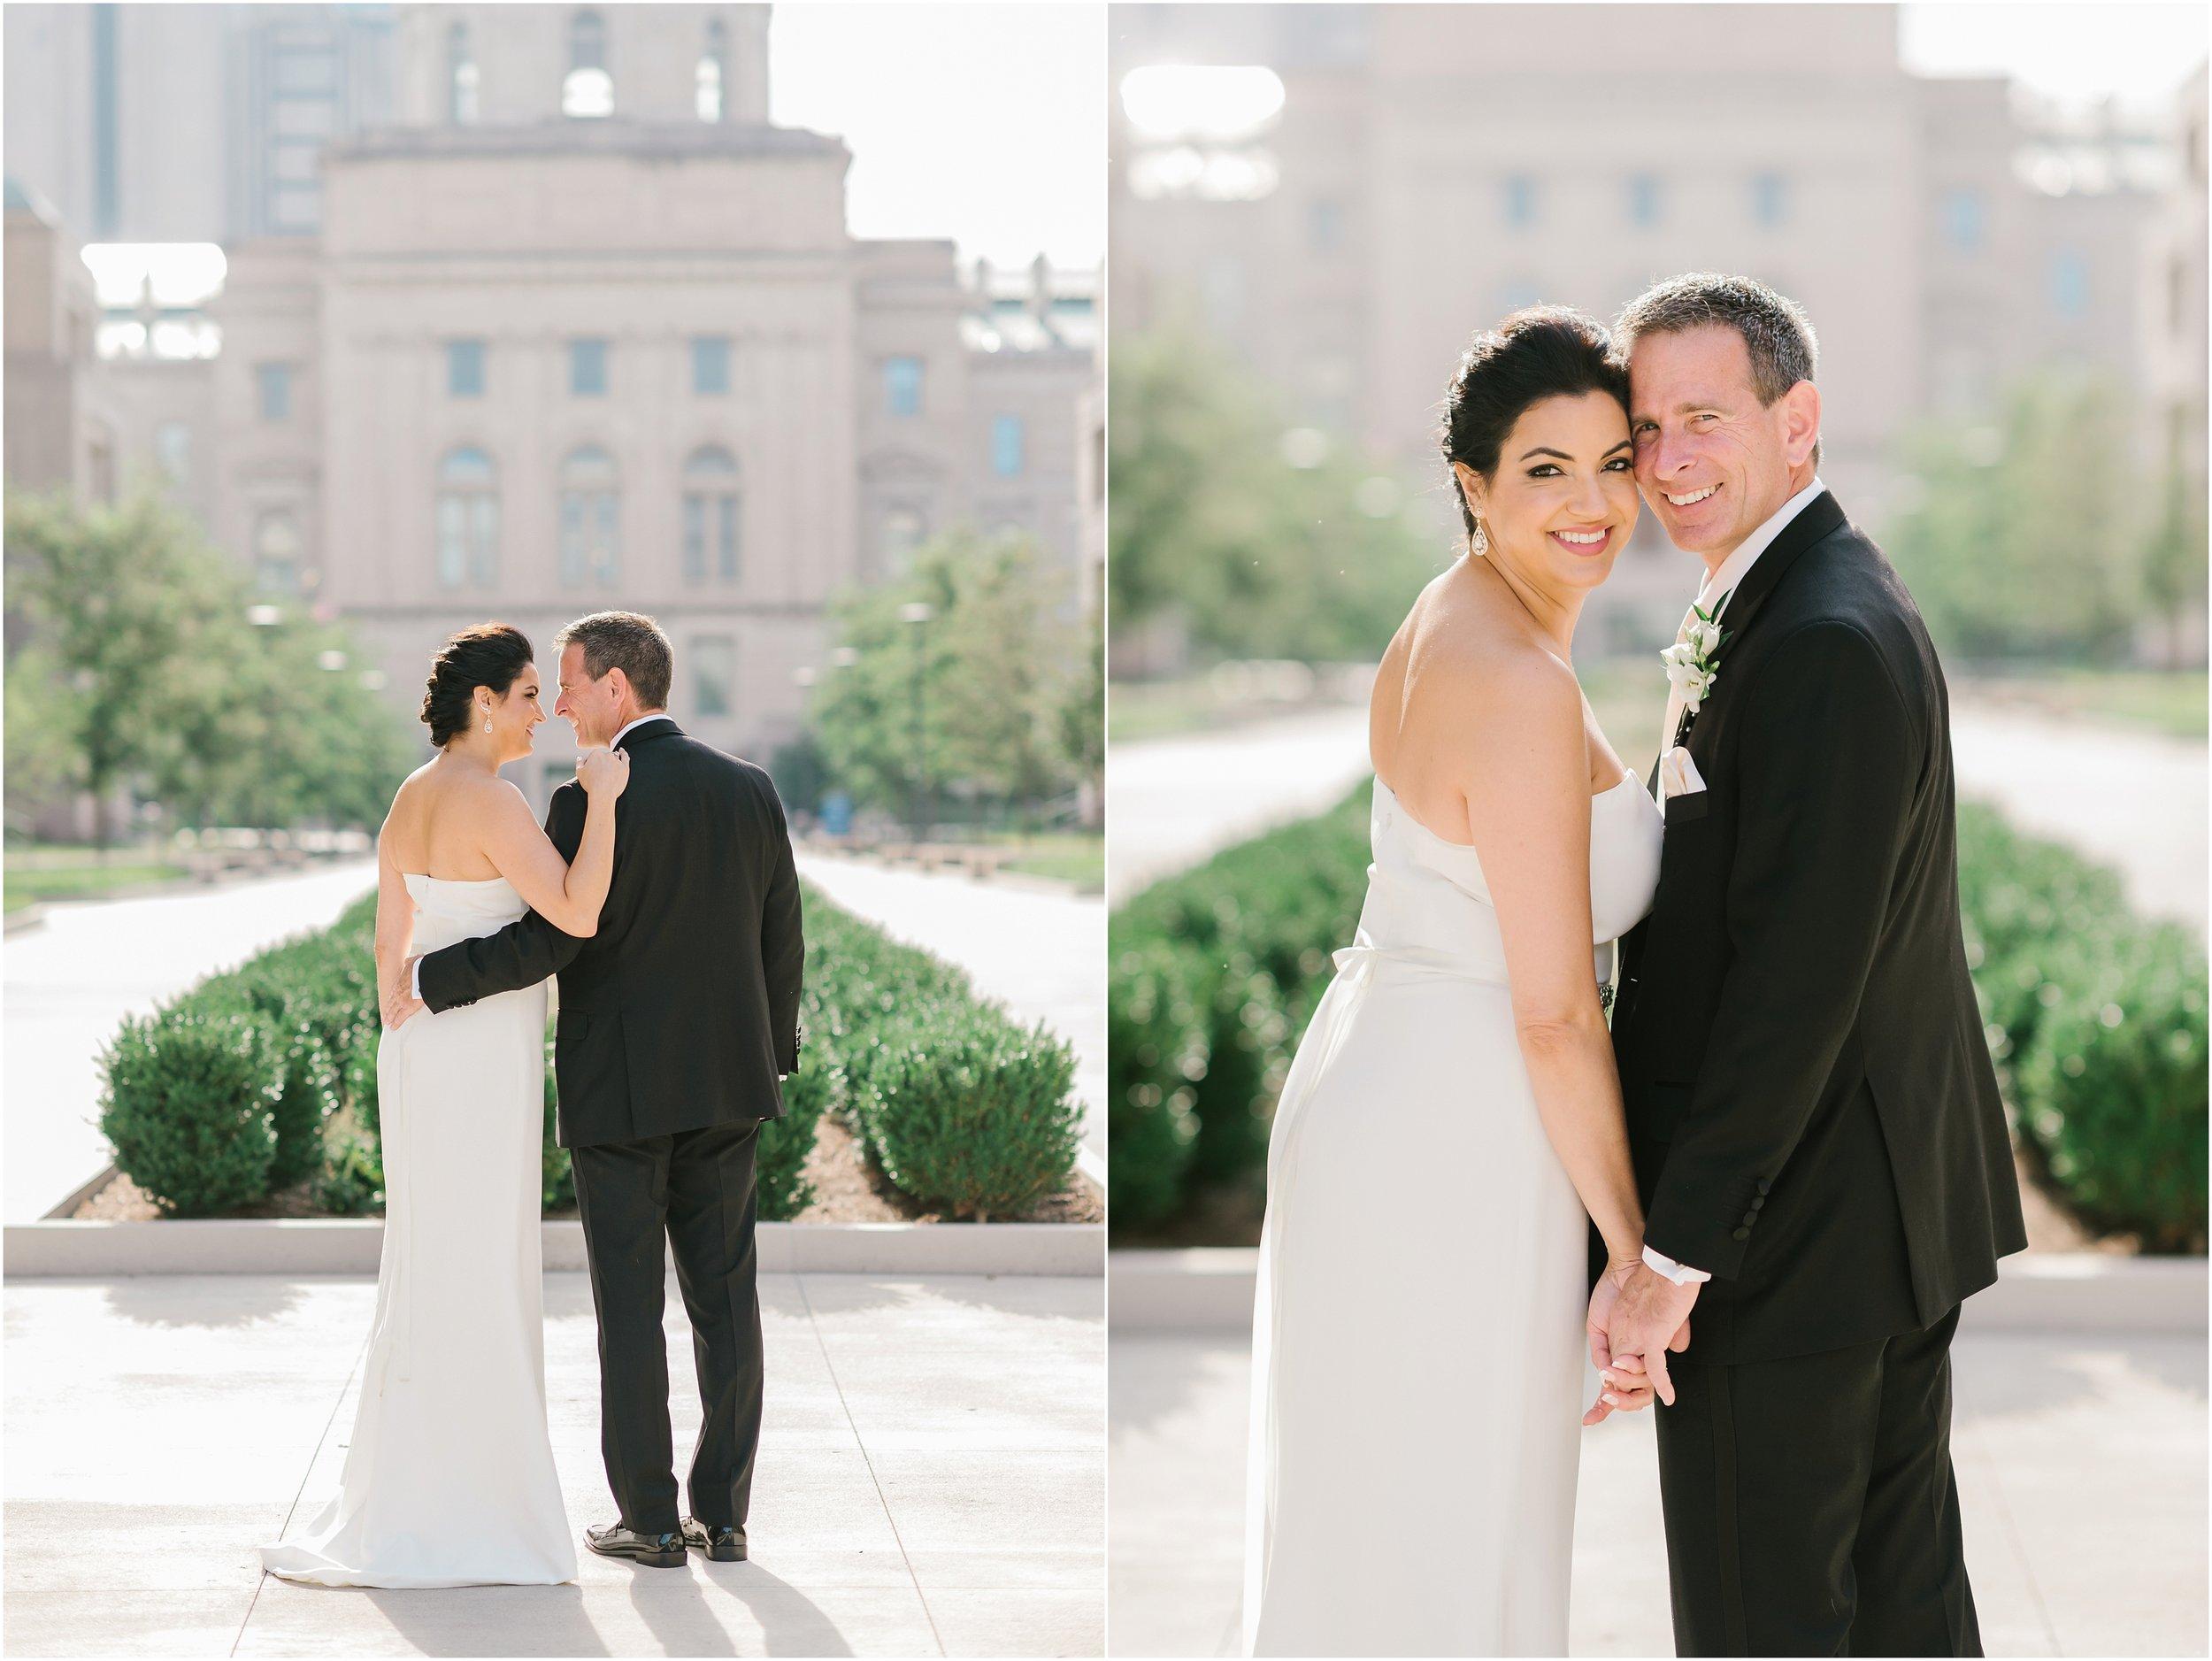 Rebecca_Shehorn_Photography_Indianapolis_Wedding_Photographer_8545.jpg